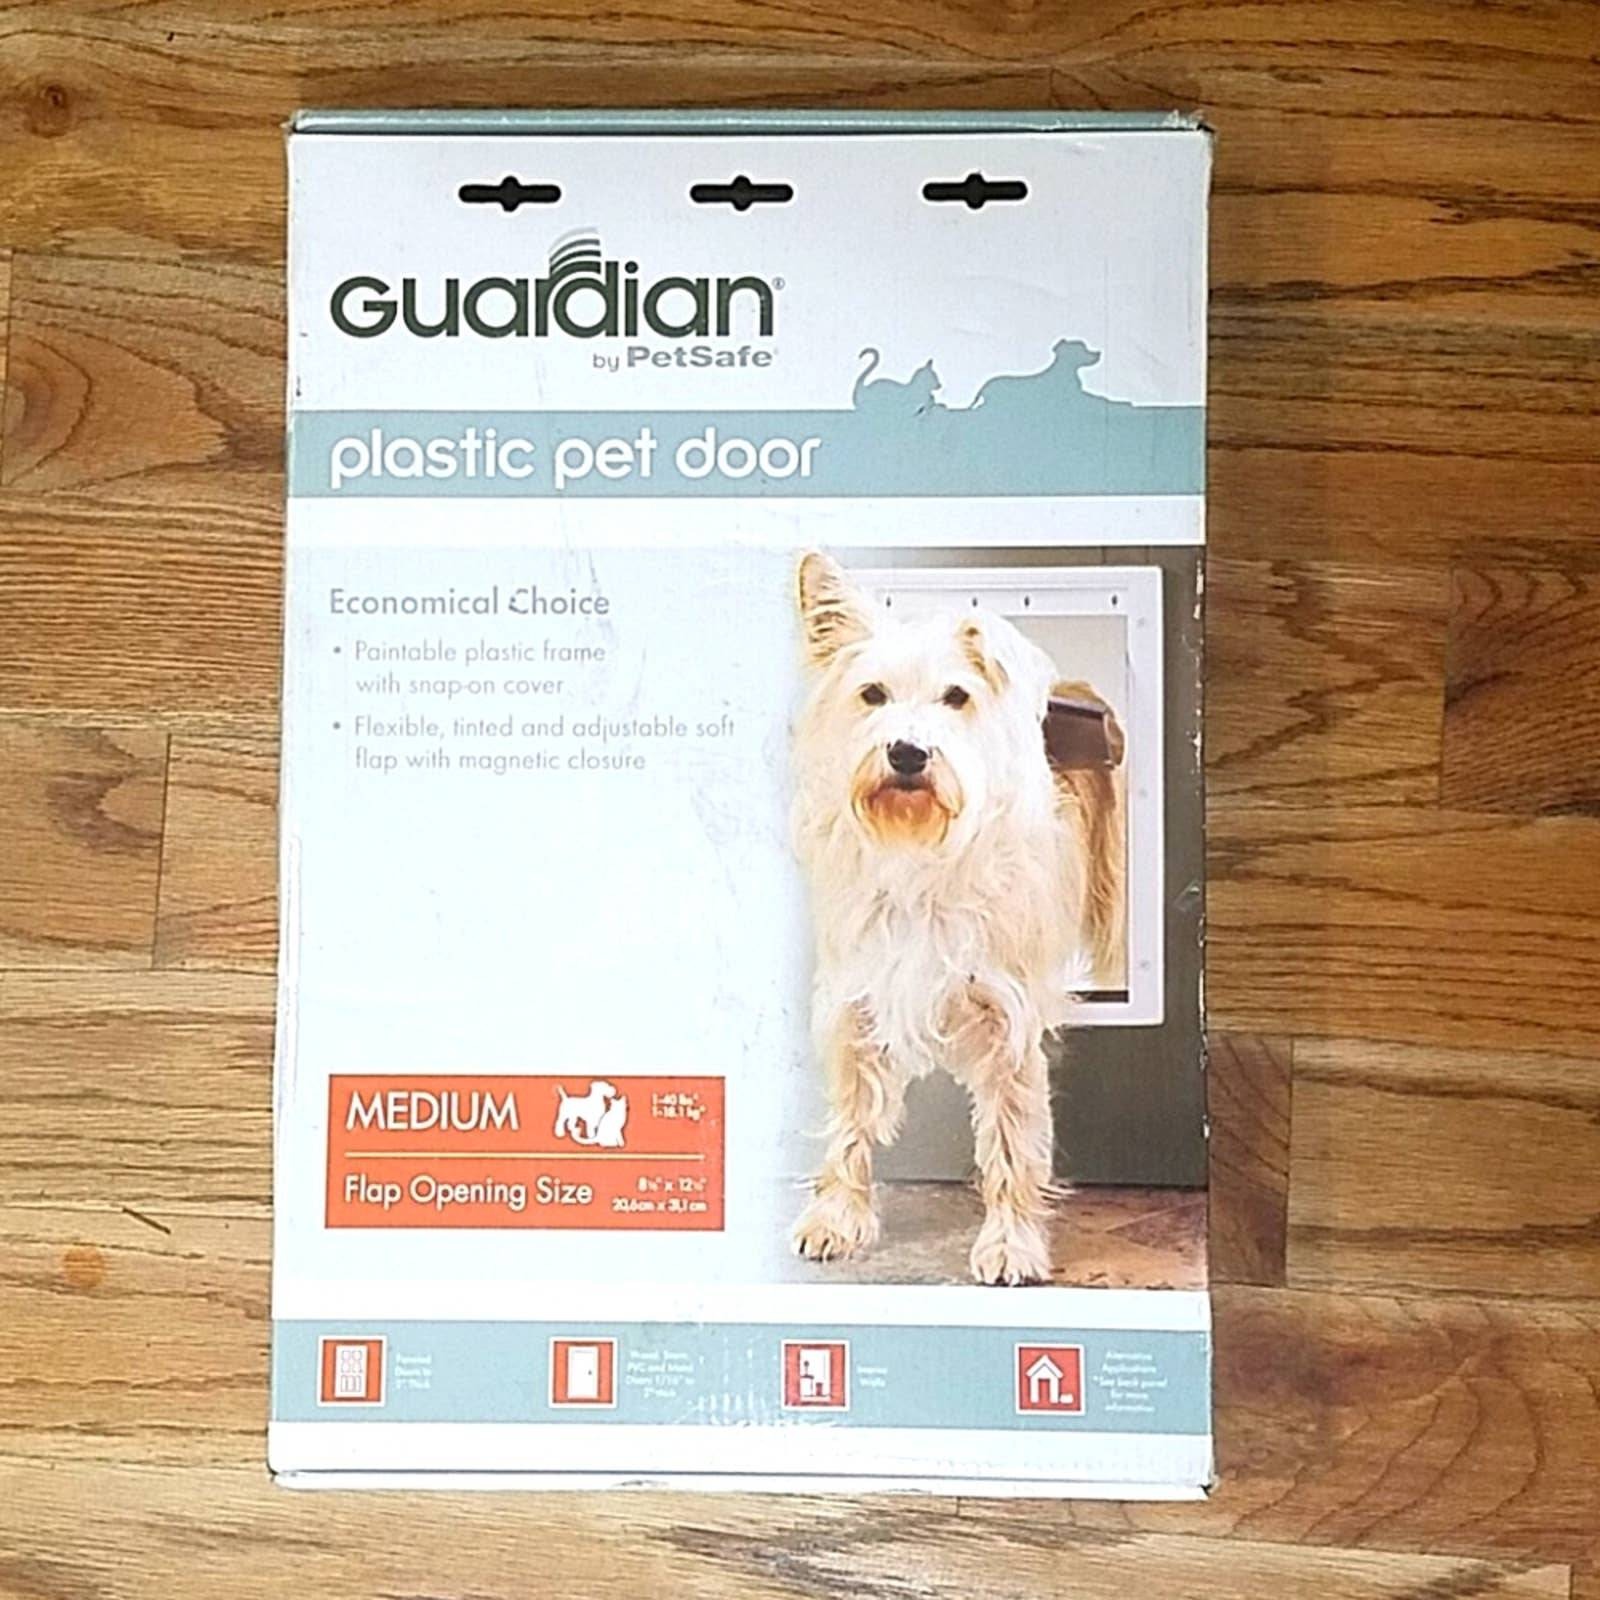 Guardian by PetSafe plastic pet door NIB